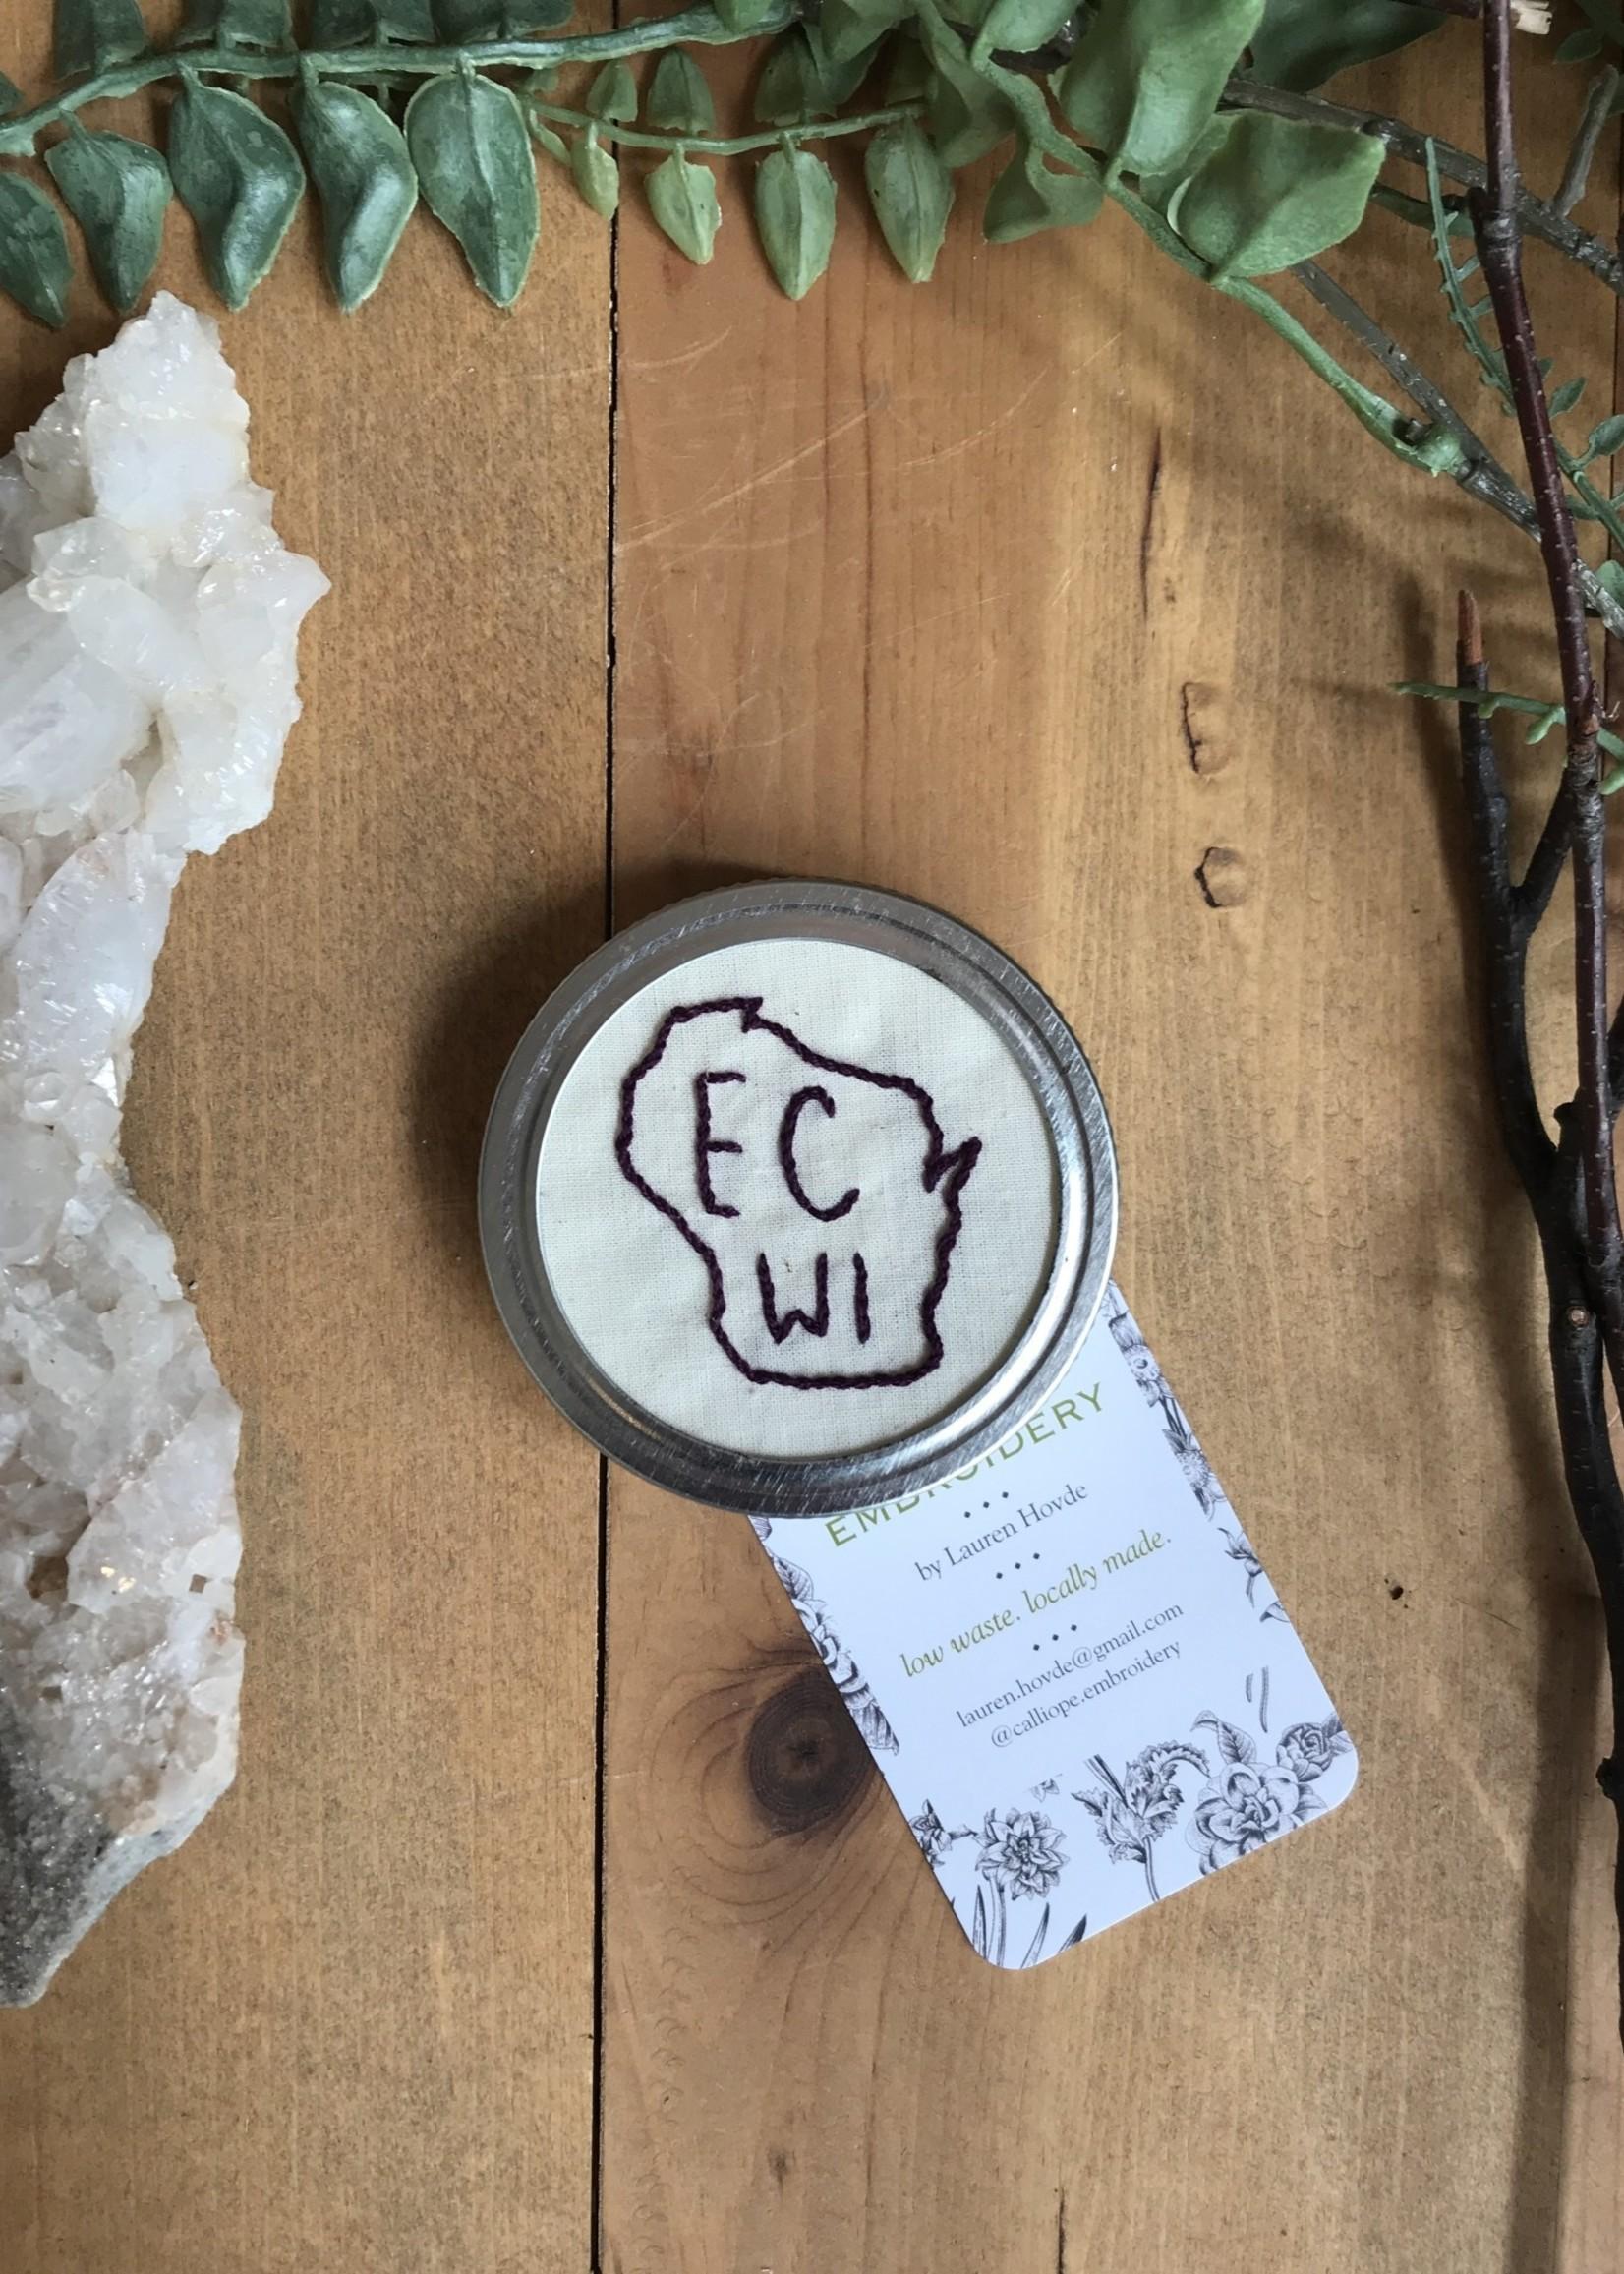 calliope embroidery EC small embroidery merlot